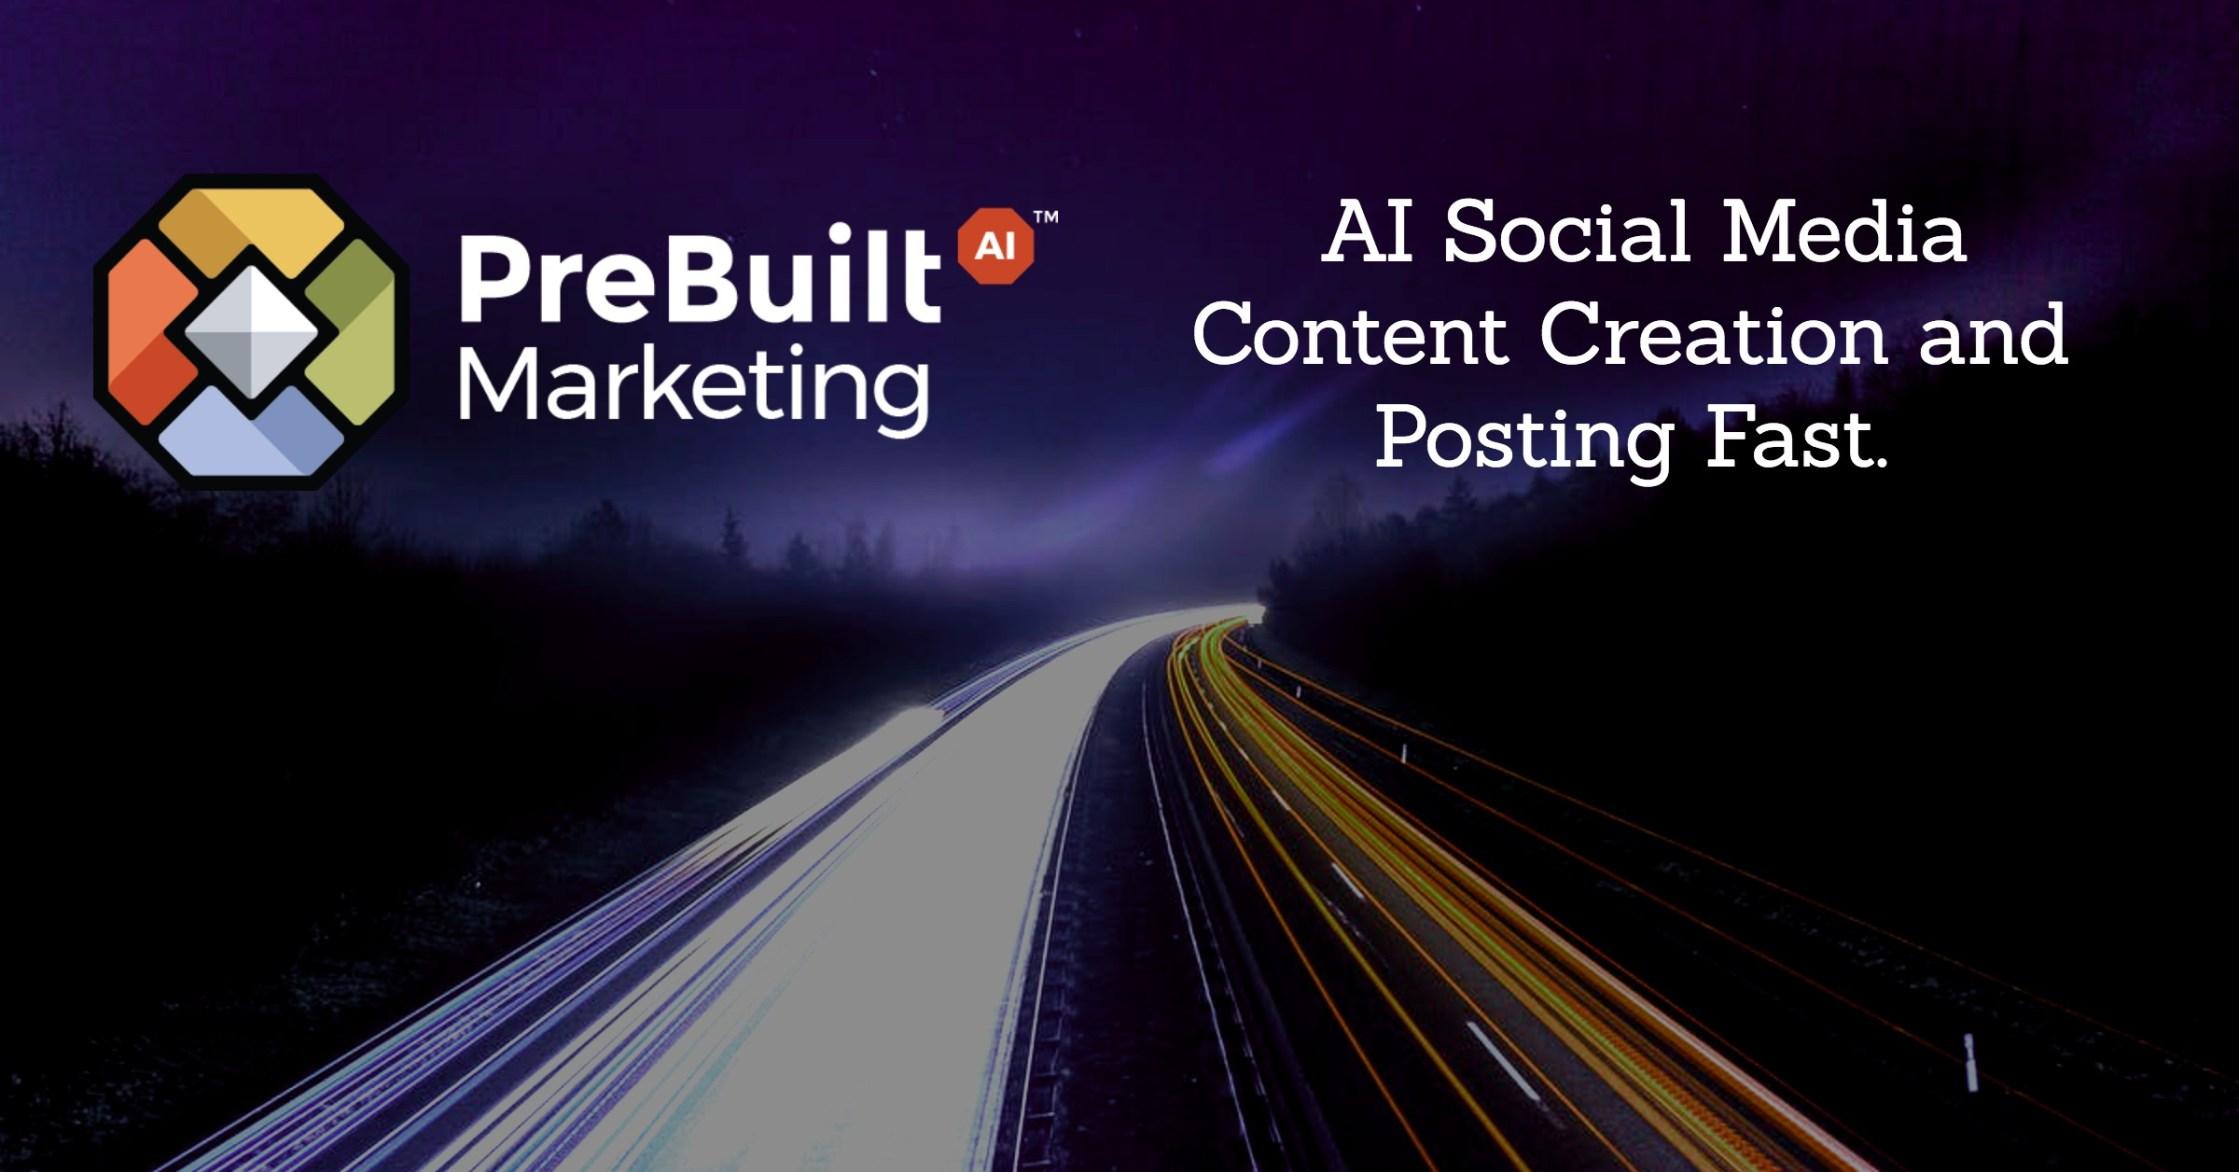 Prebuilt Marketing AI - AI Social Media Content Creation and Posting Fast